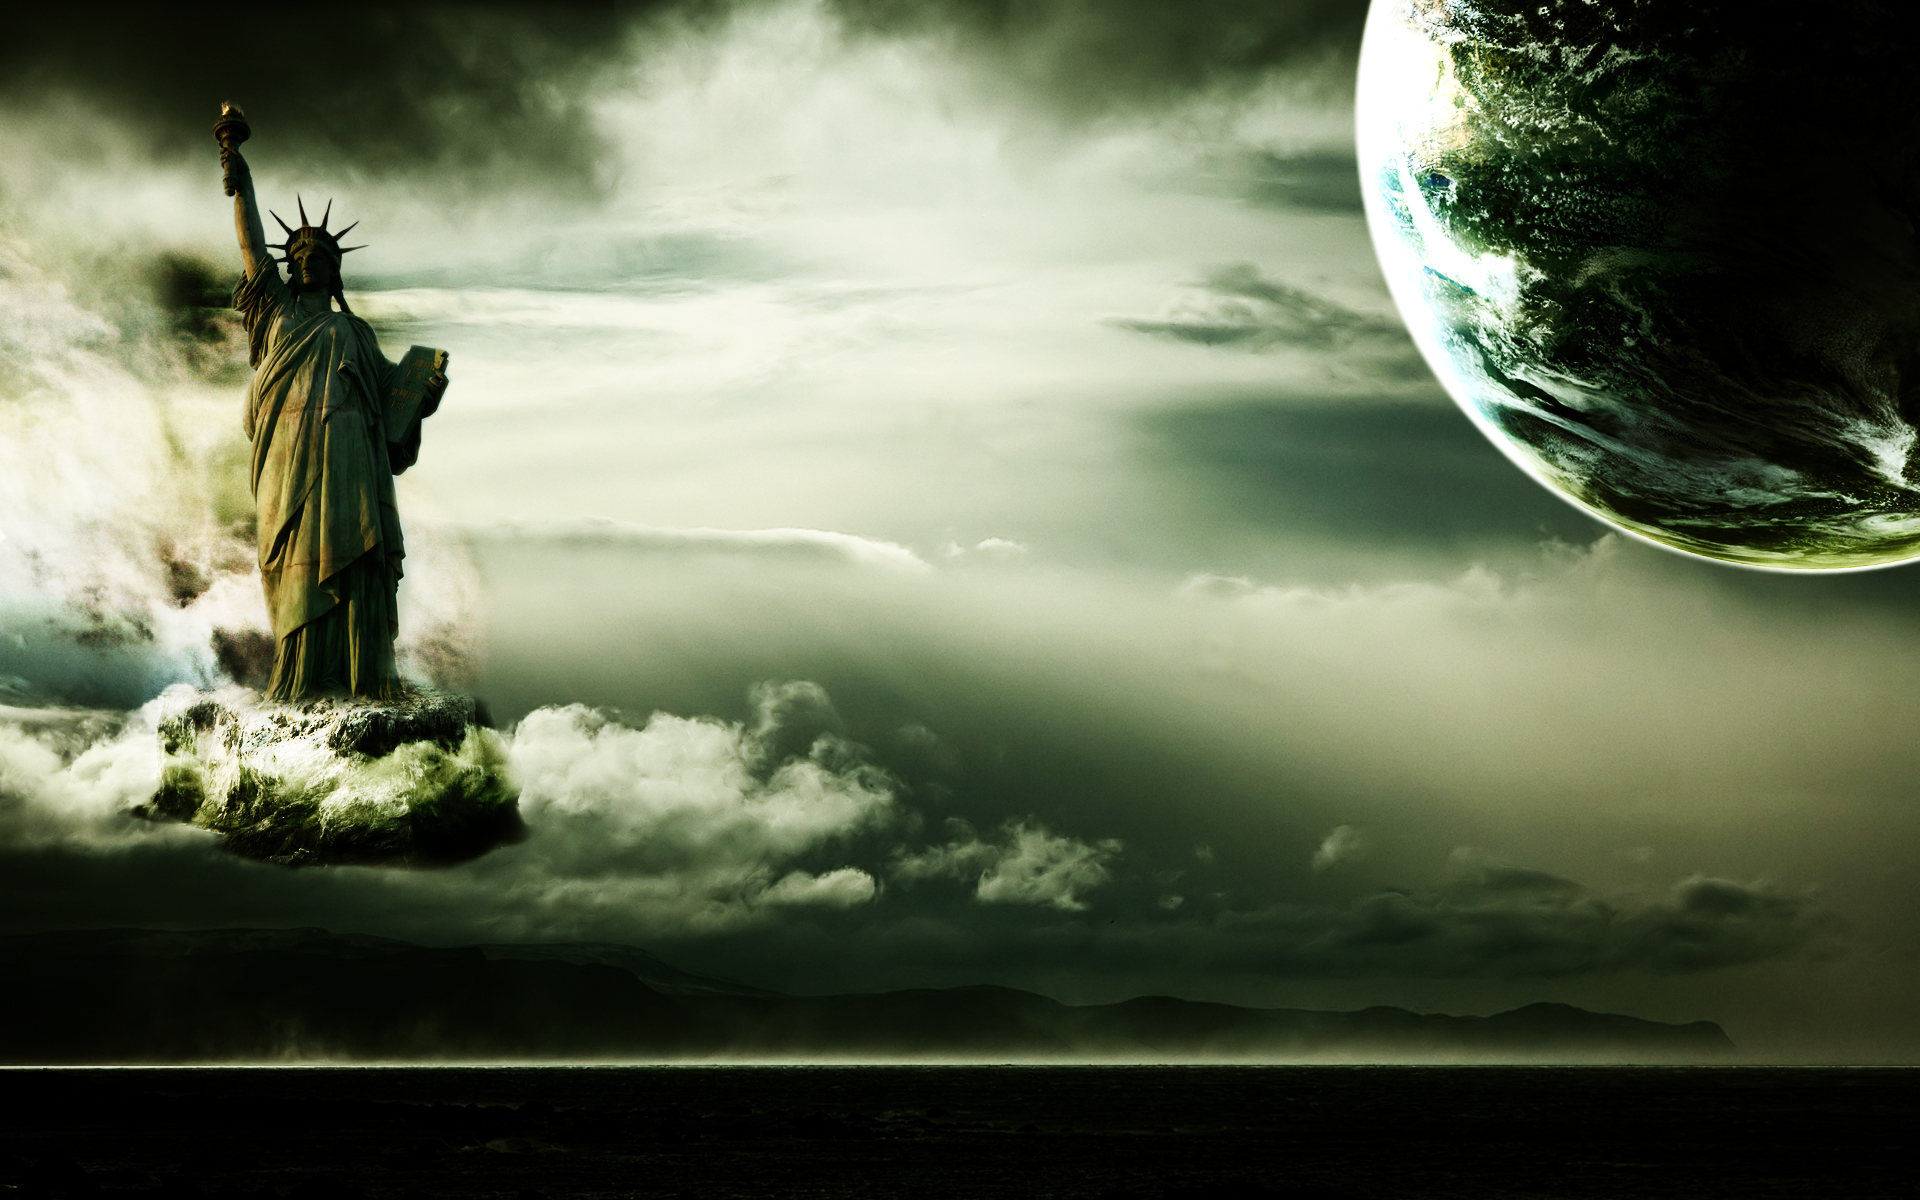 https://fc06.deviantart.com/fs43/f/2009/116/c/6/Mystic_America_by_munasef.jpg